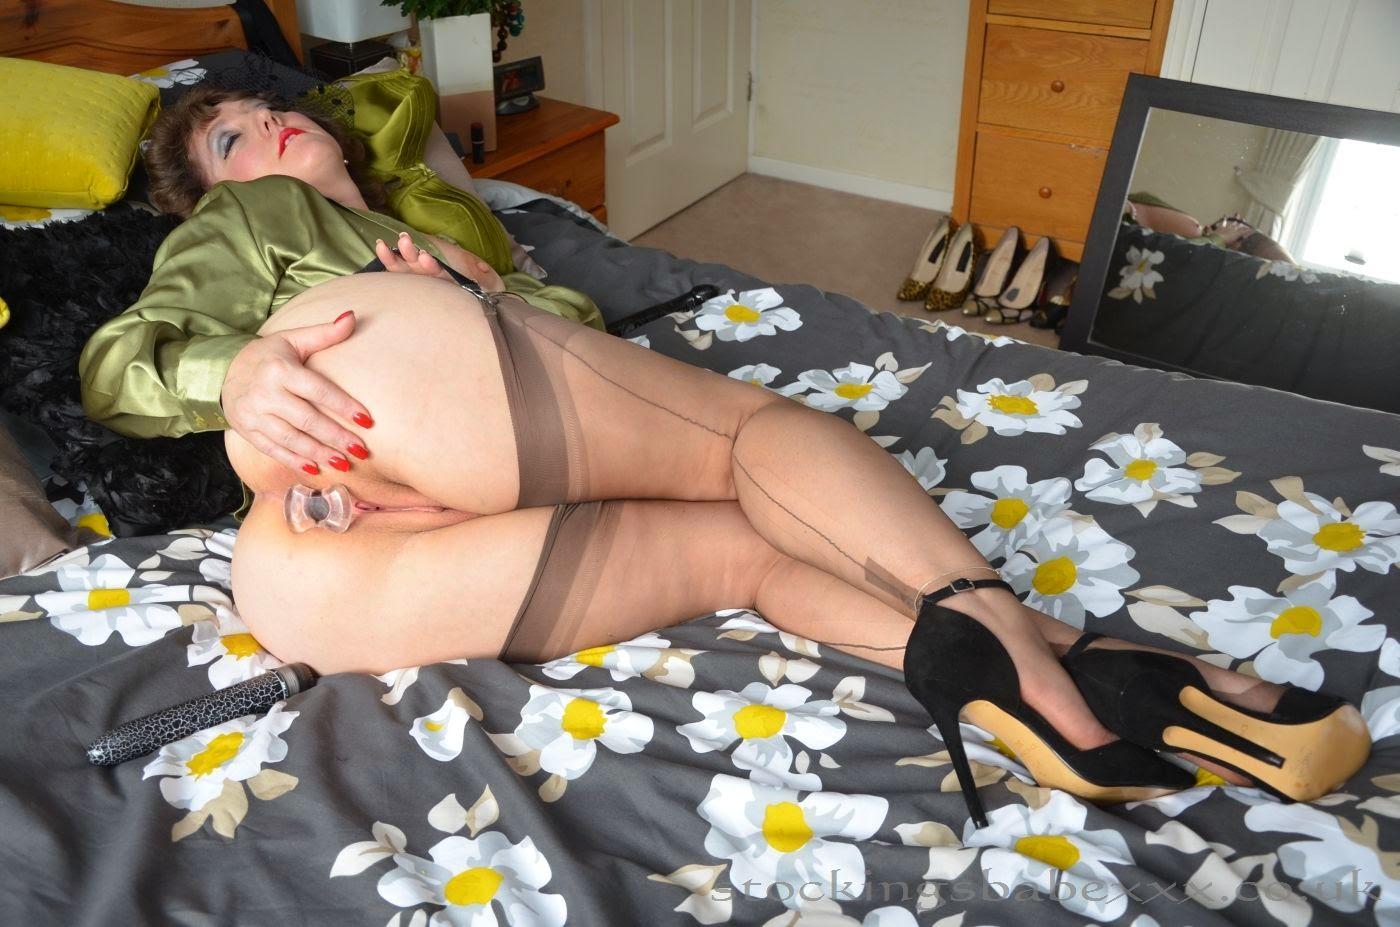 Any nude photos of zac efron